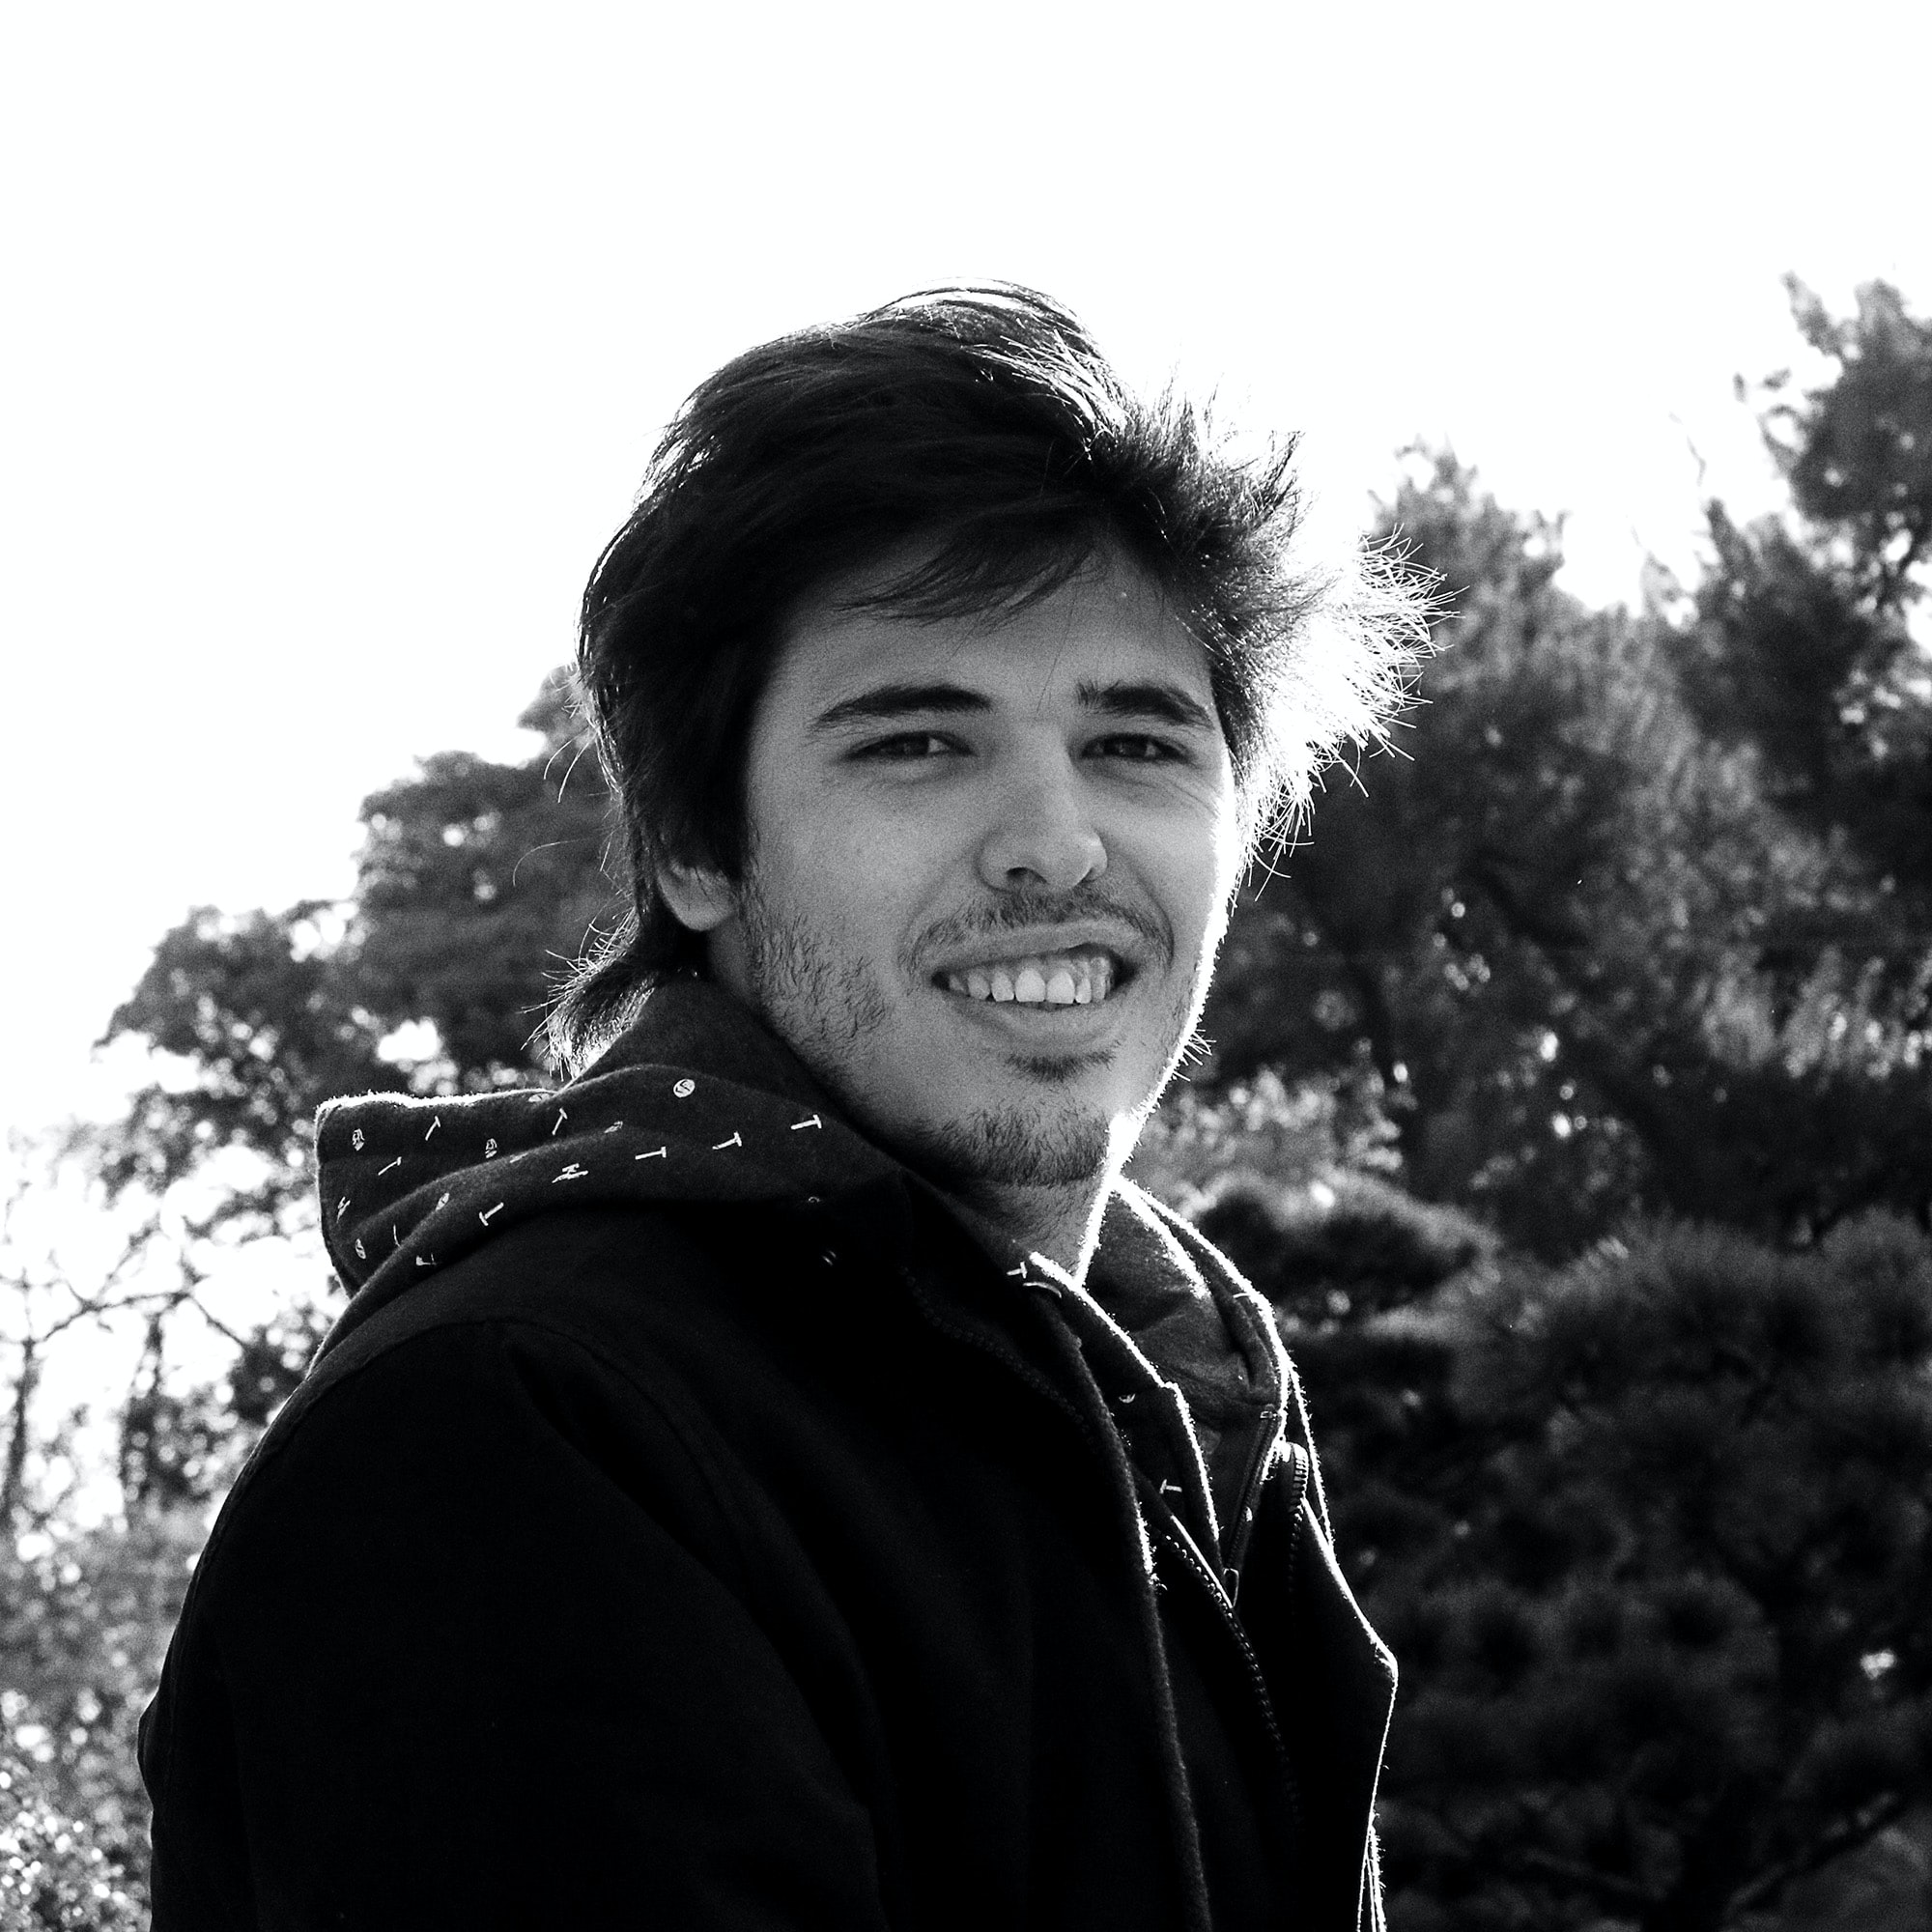 Go to juan verdaguer aguerrebehere's profile